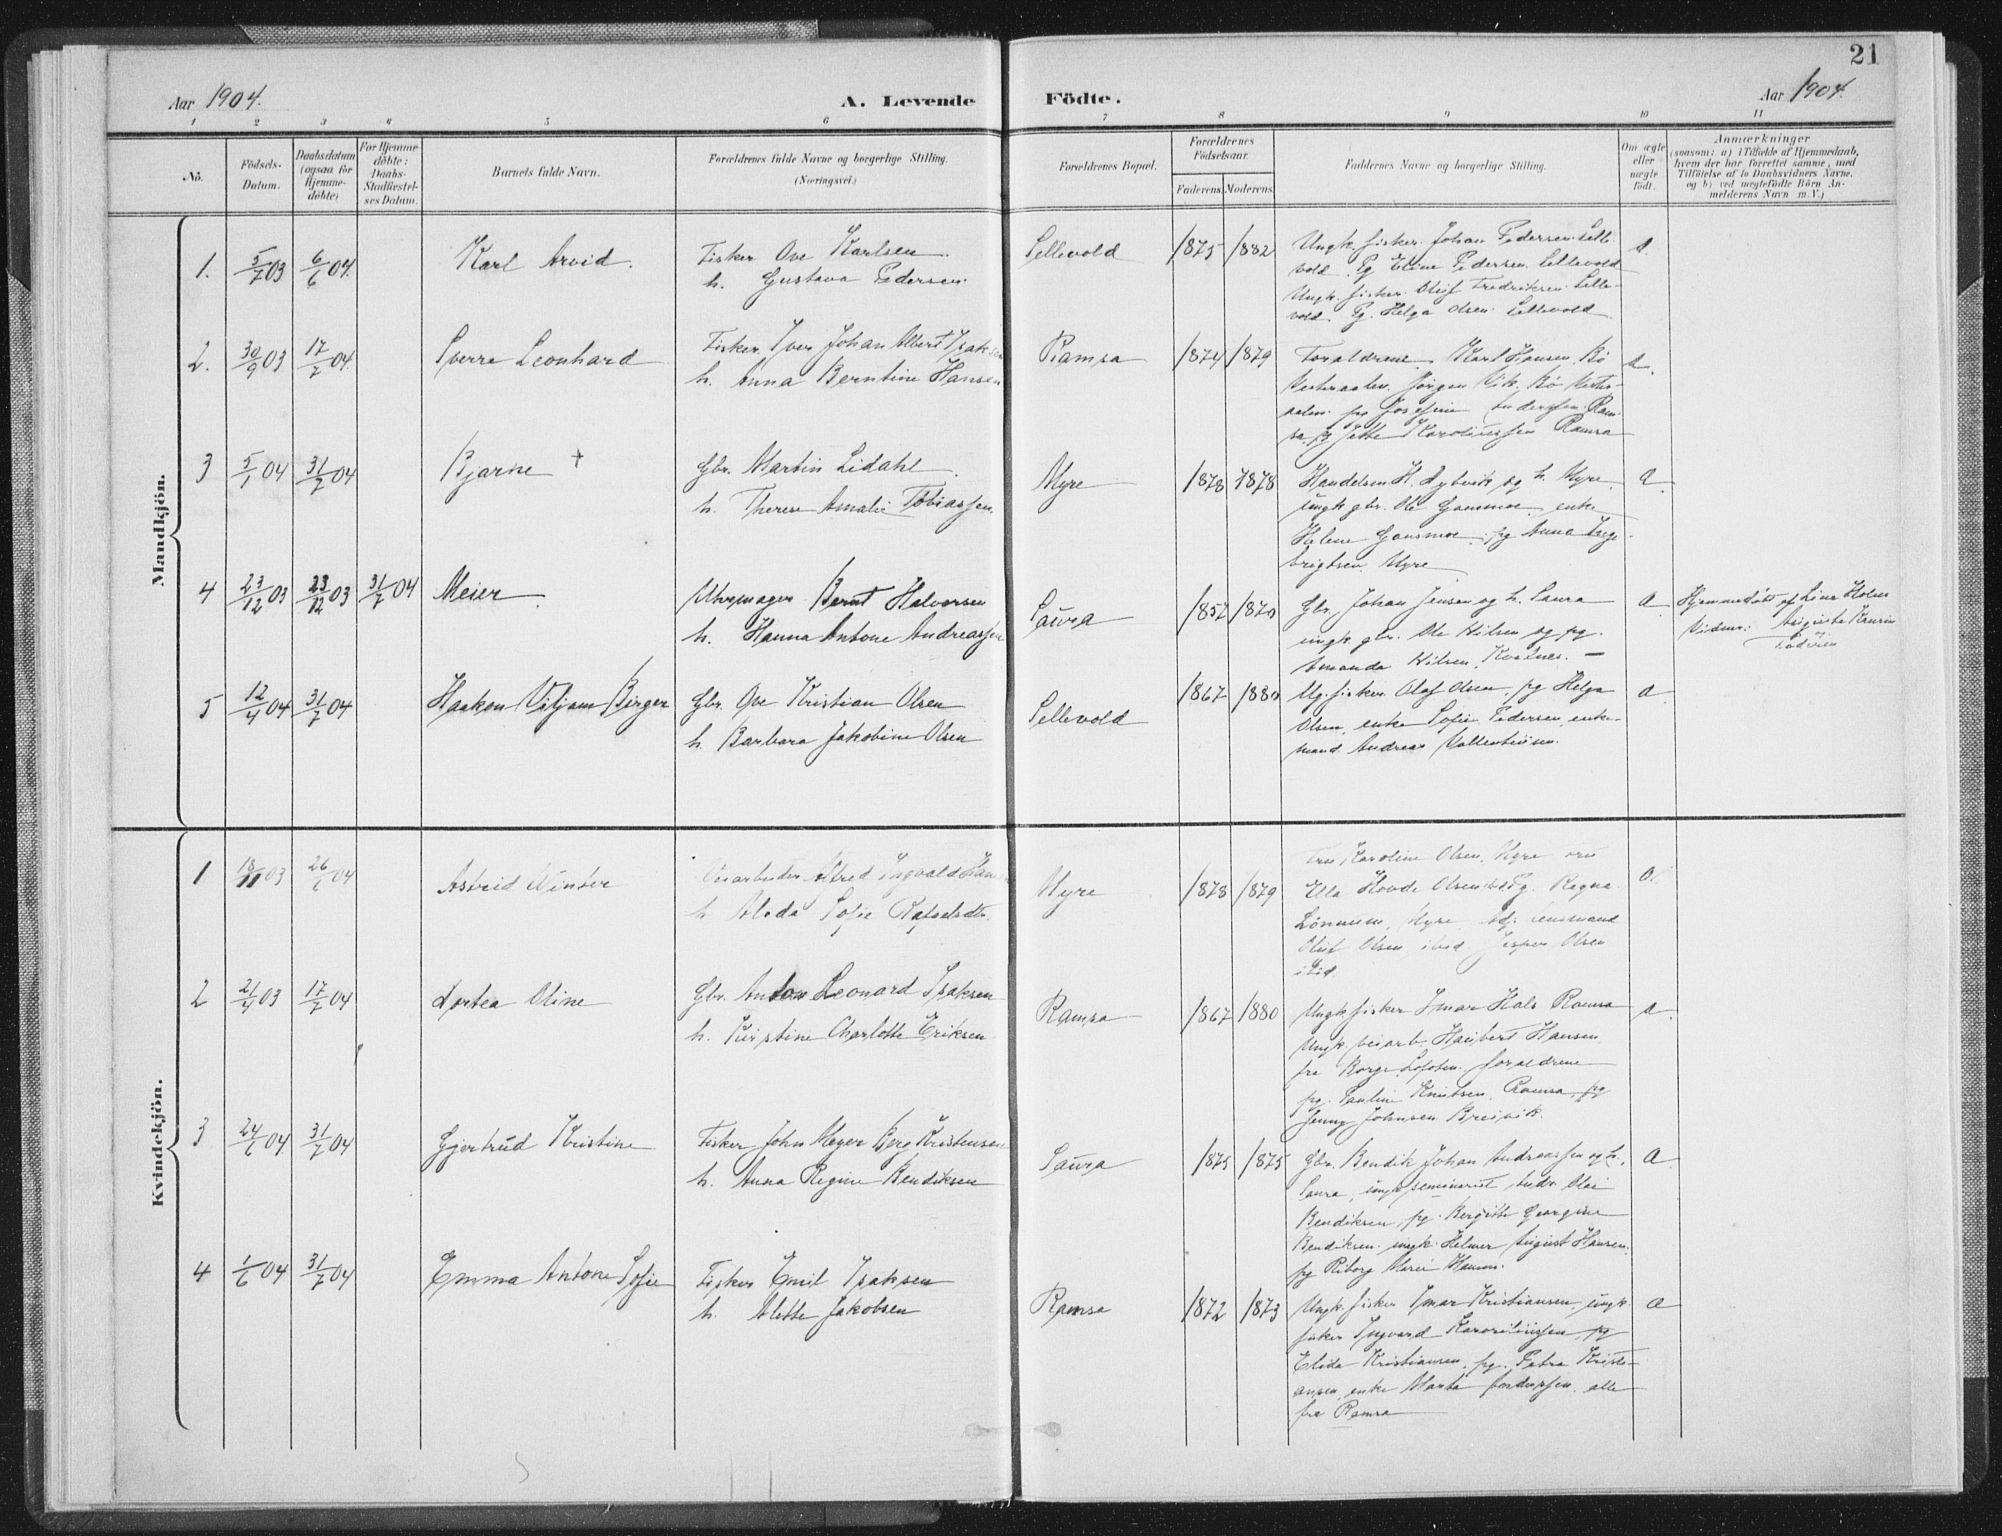 SAT, Ministerialprotokoller, klokkerbøker og fødselsregistre - Nordland, 897/L1400: Ministerialbok nr. 897A07, 1897-1908, s. 21